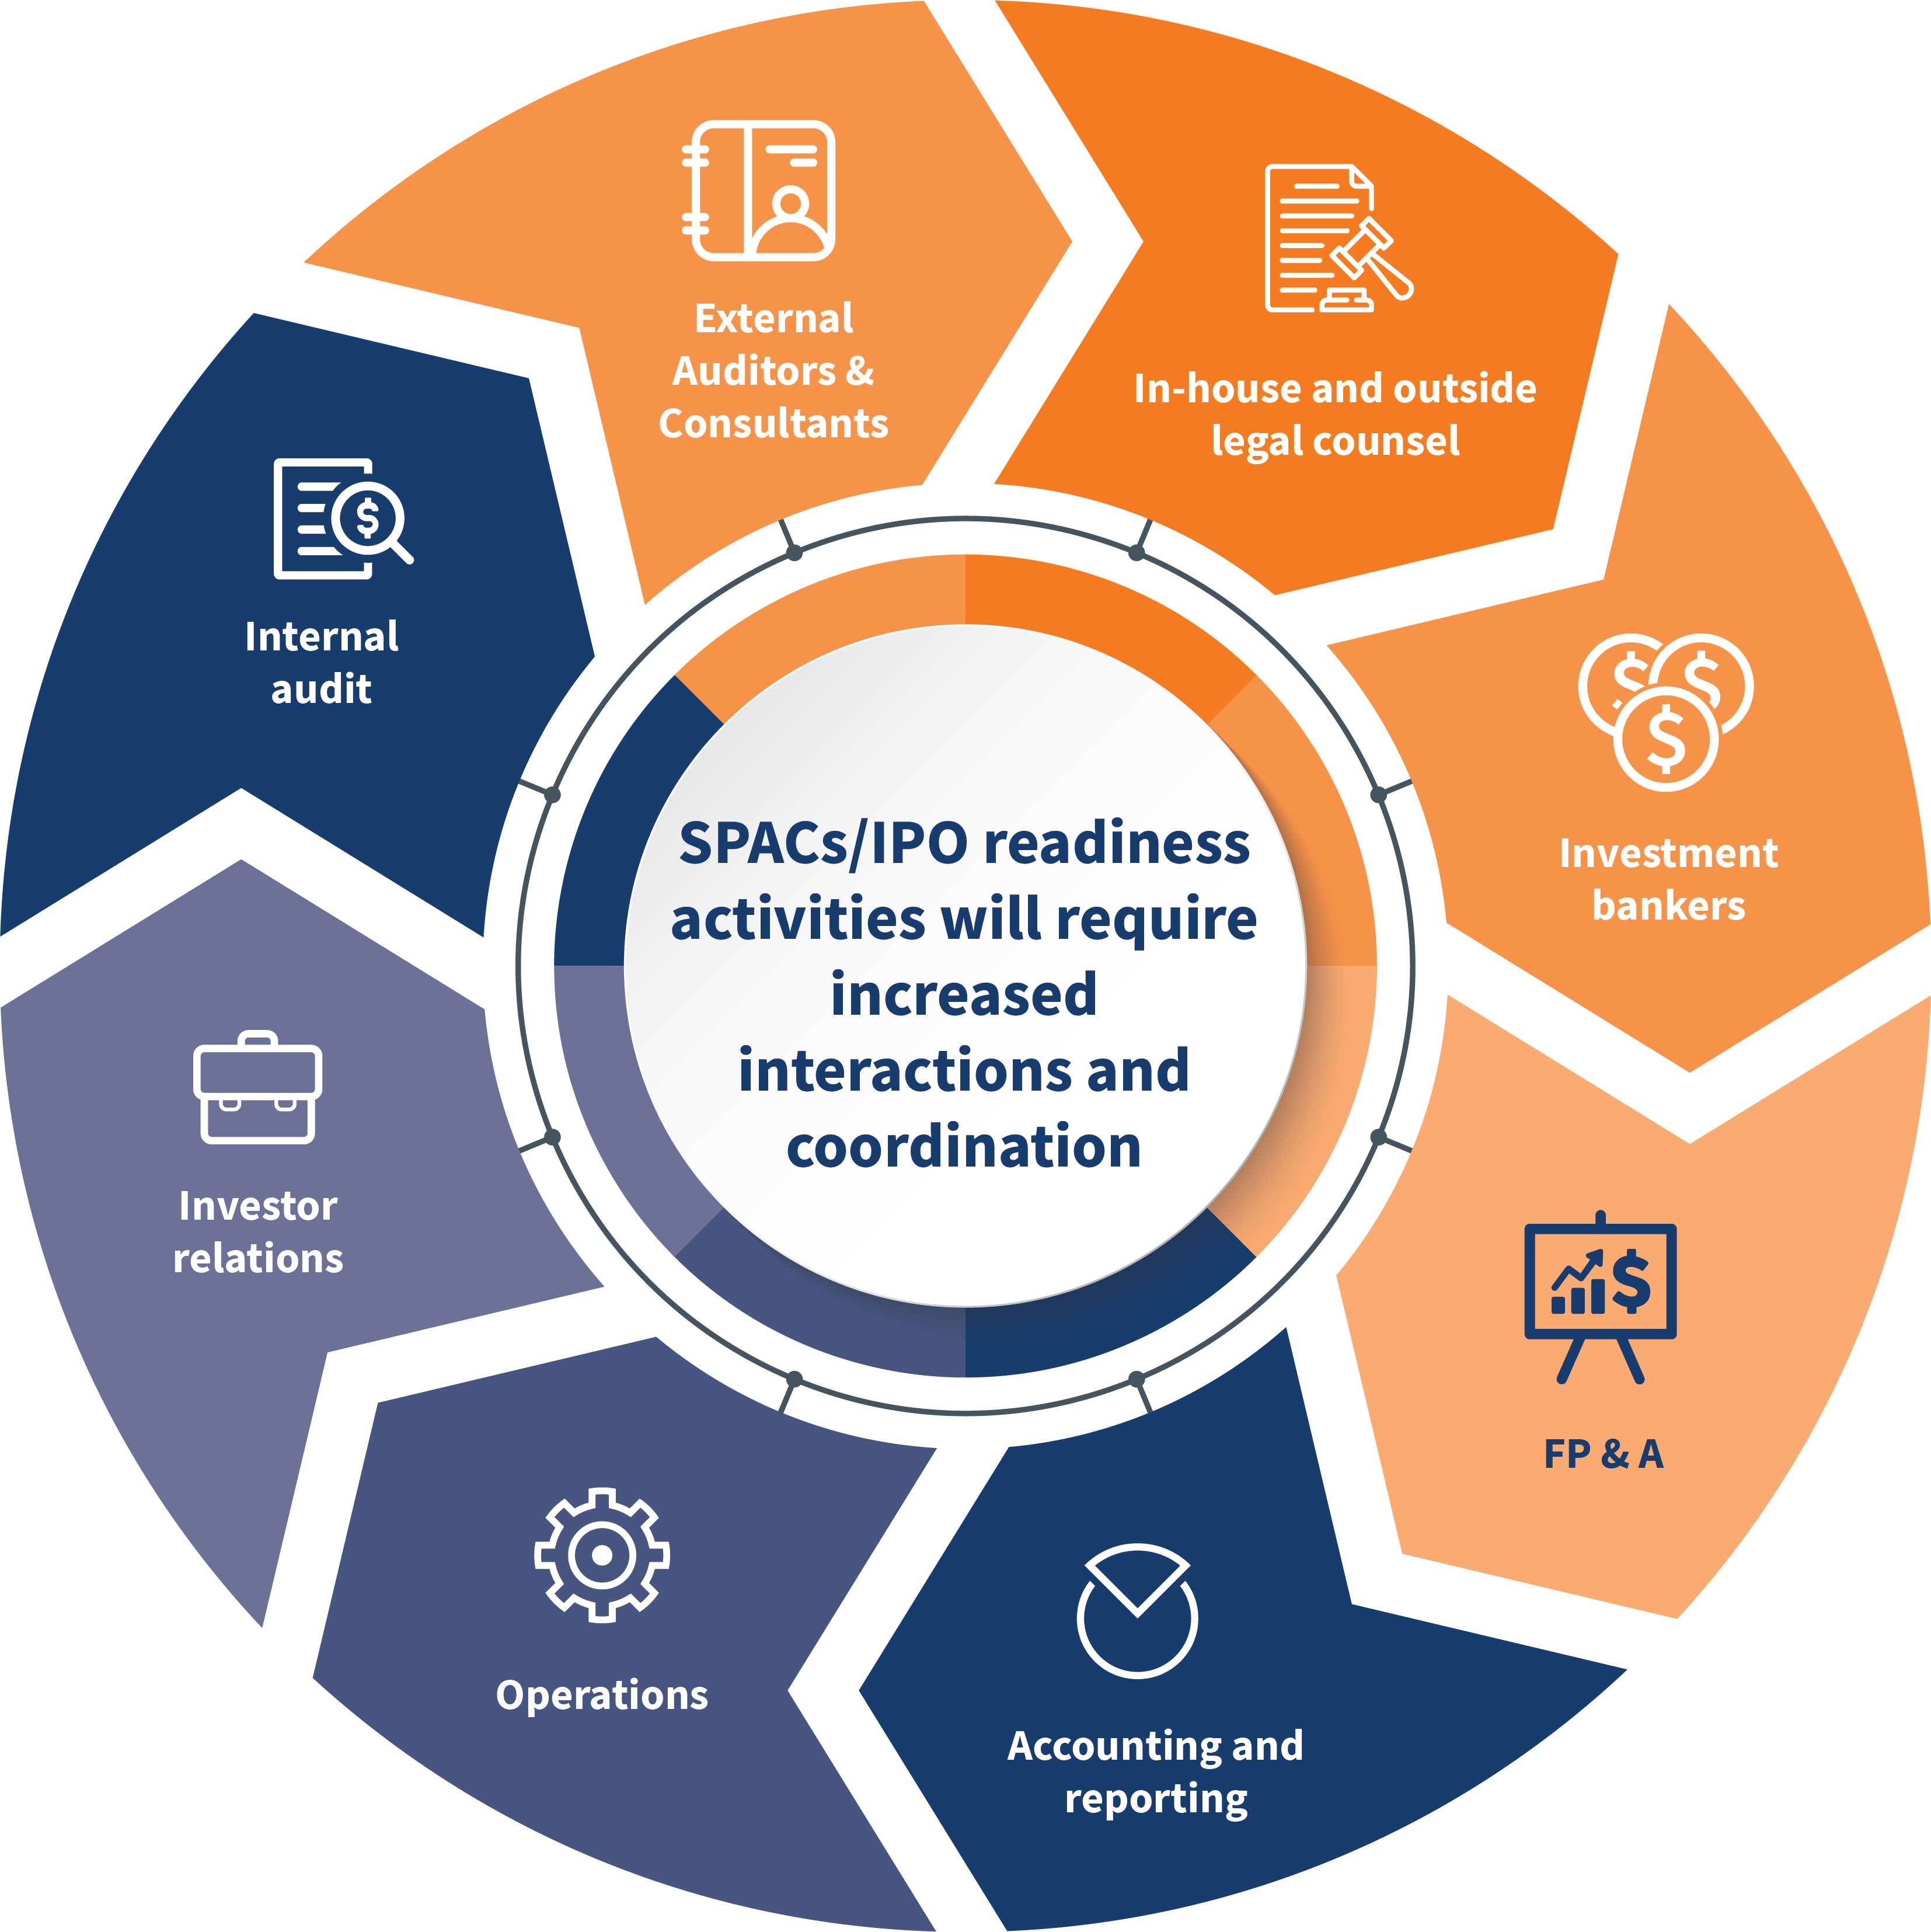 SPACs/ IPO readiness activities